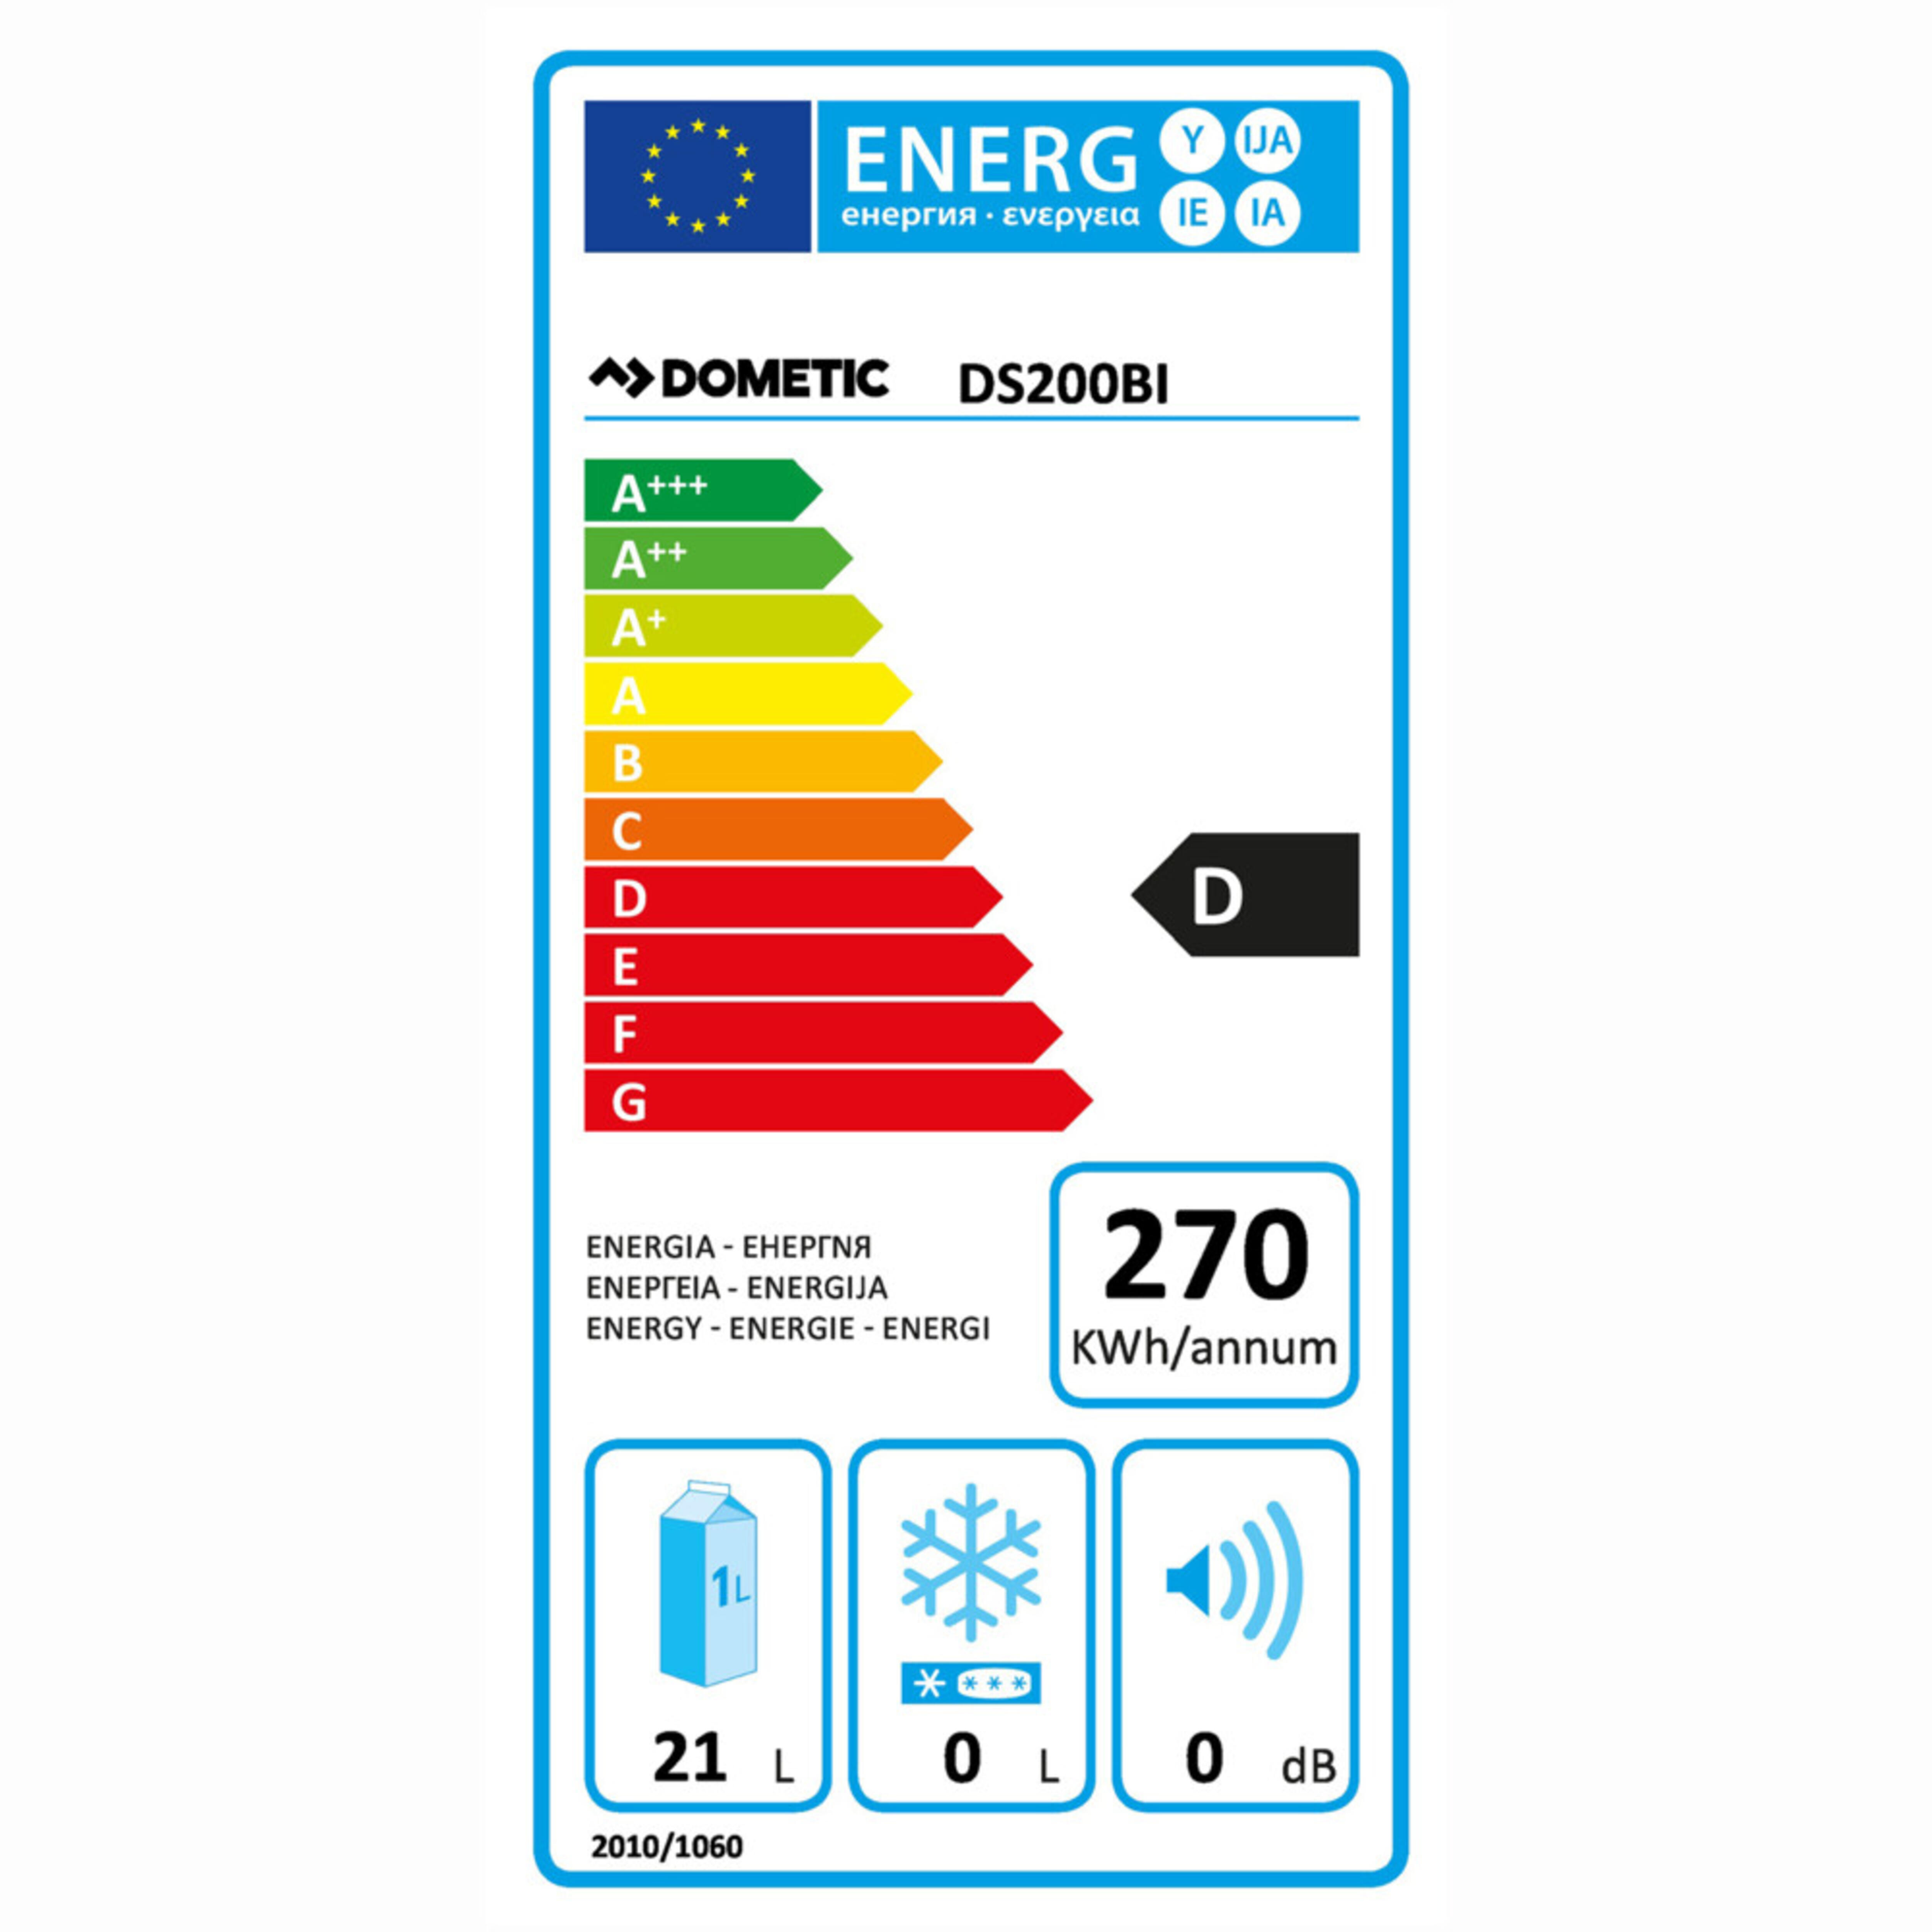 Dometic DS 200BI Energy label